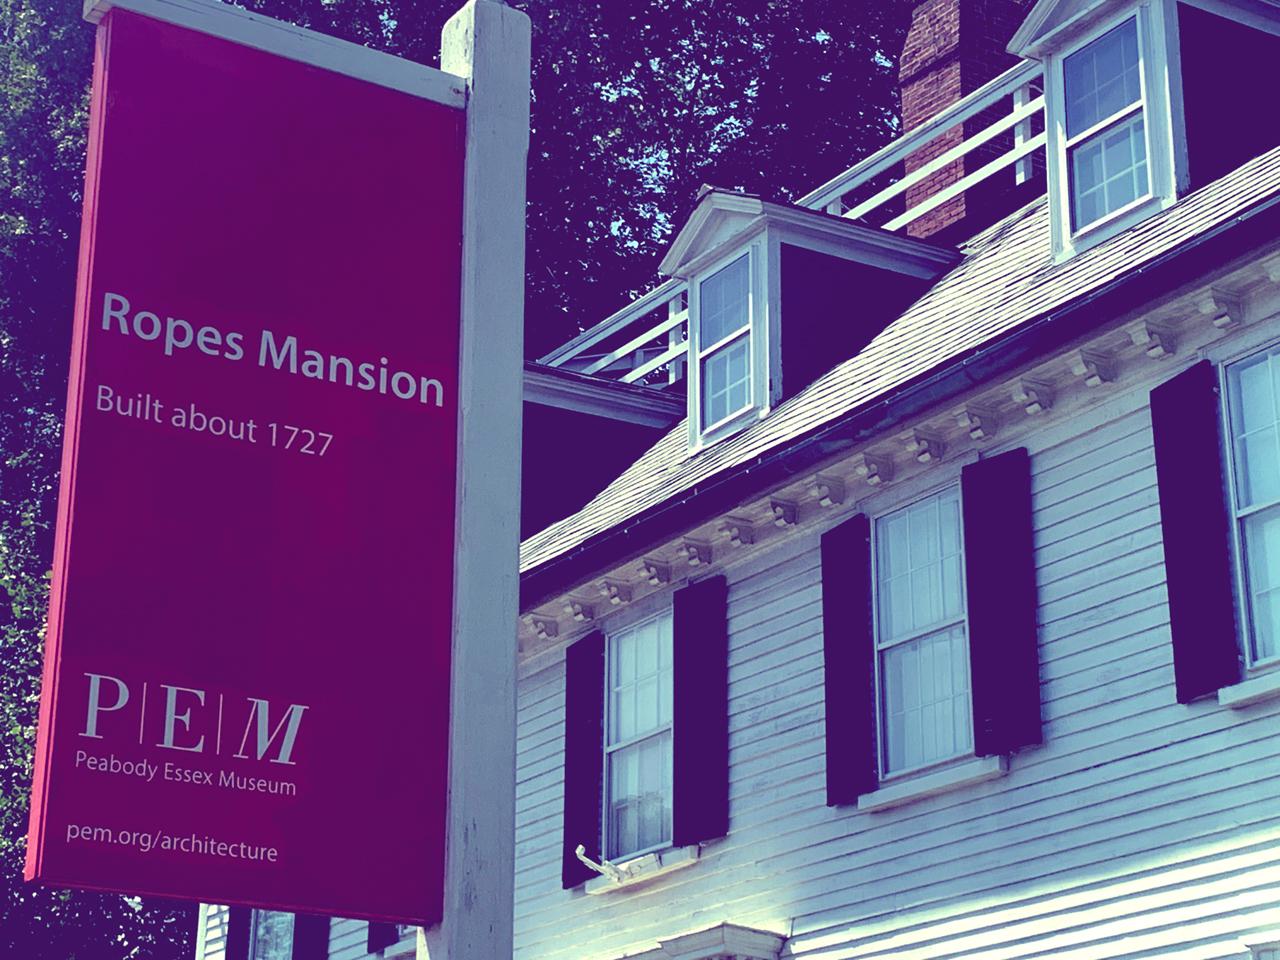 ropes-mansion-salem-massachusetts-1280x960-02